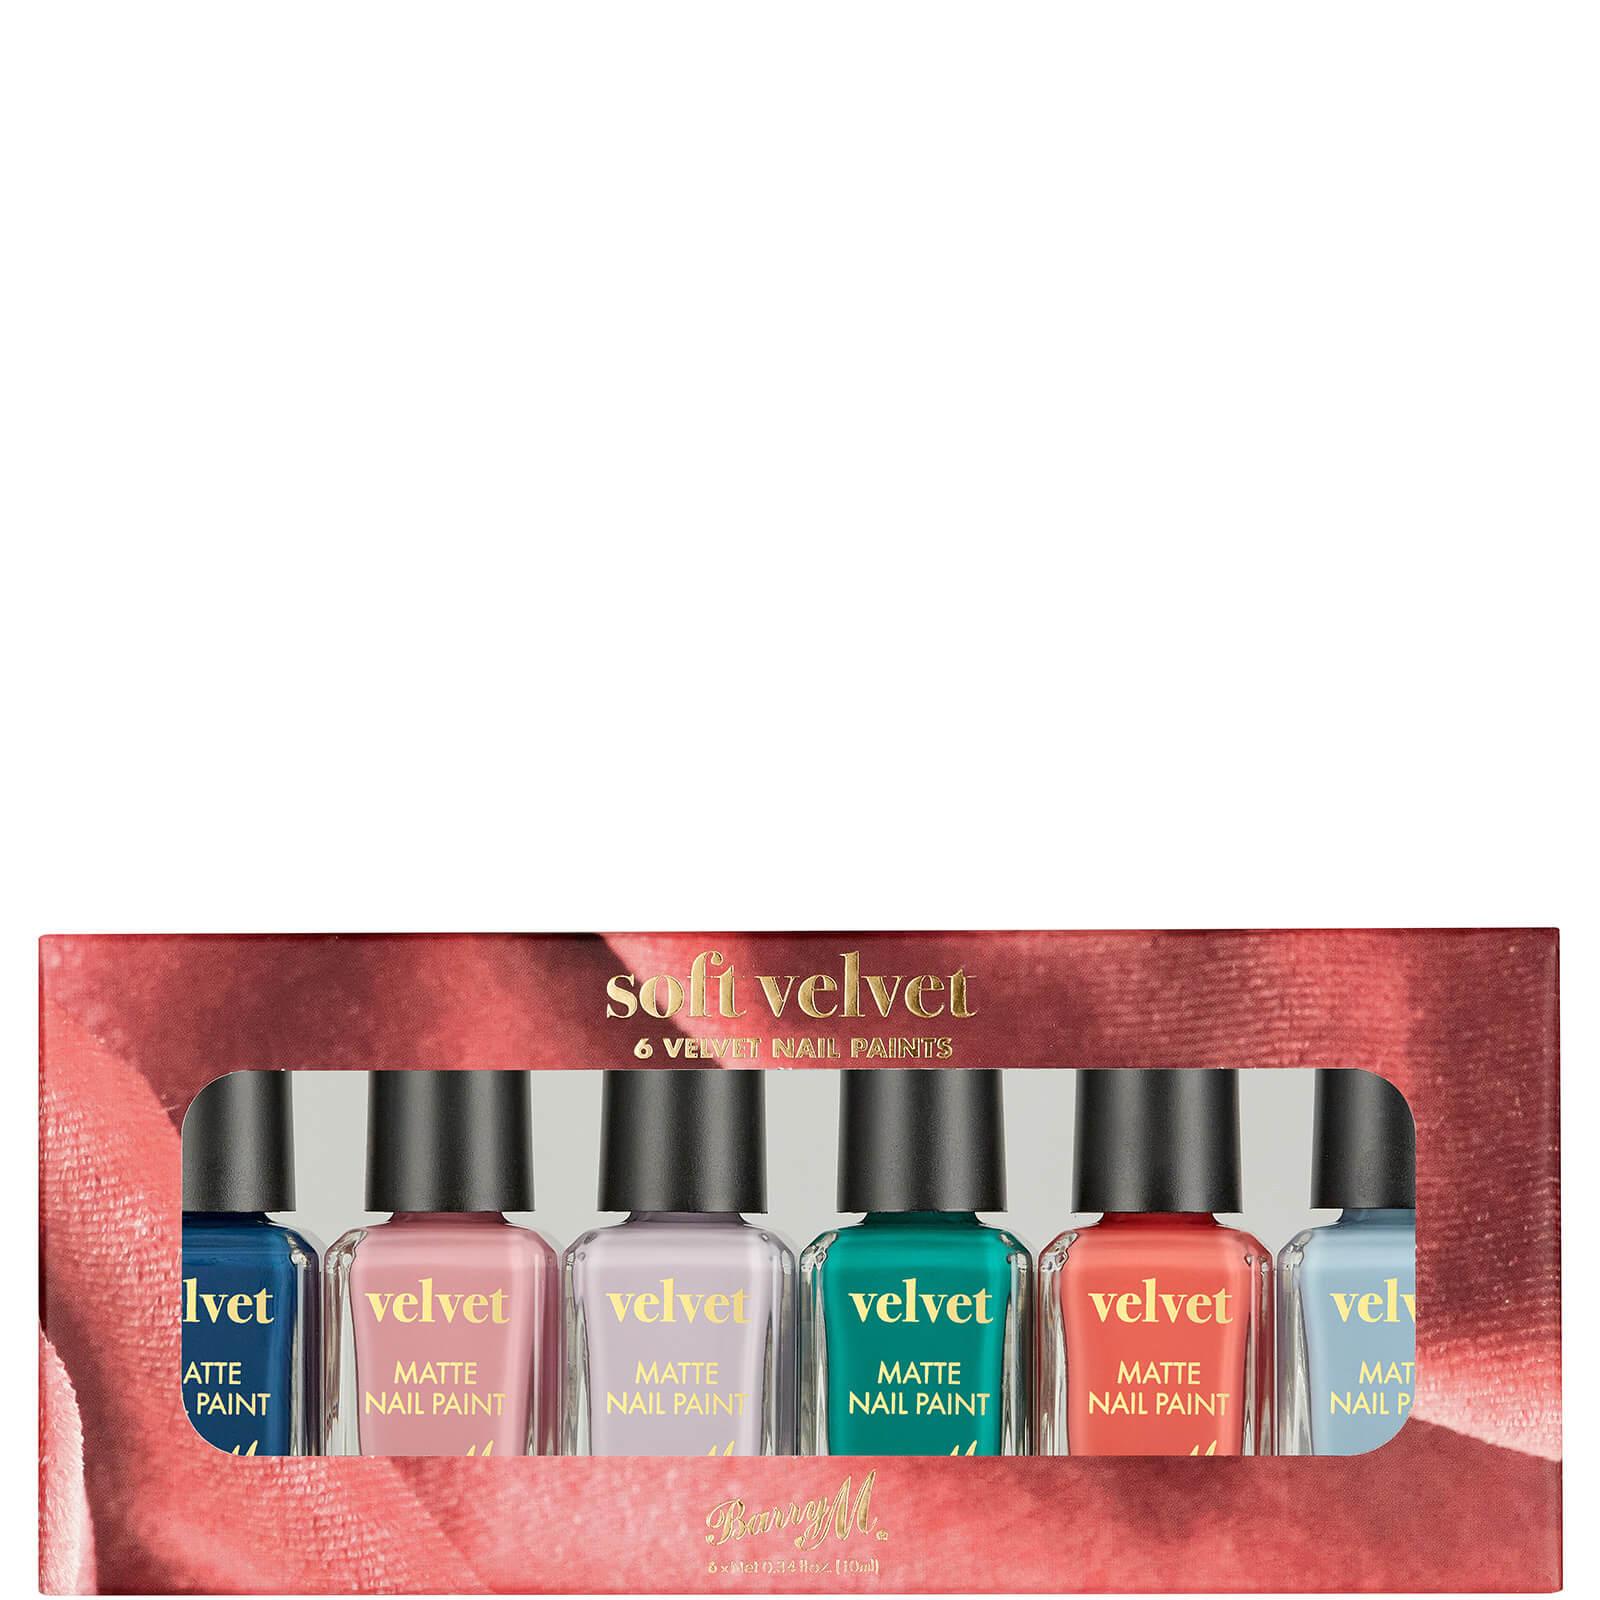 Купить Barry M Cosmetics Nail Paint Gift Set - Soft Velvet